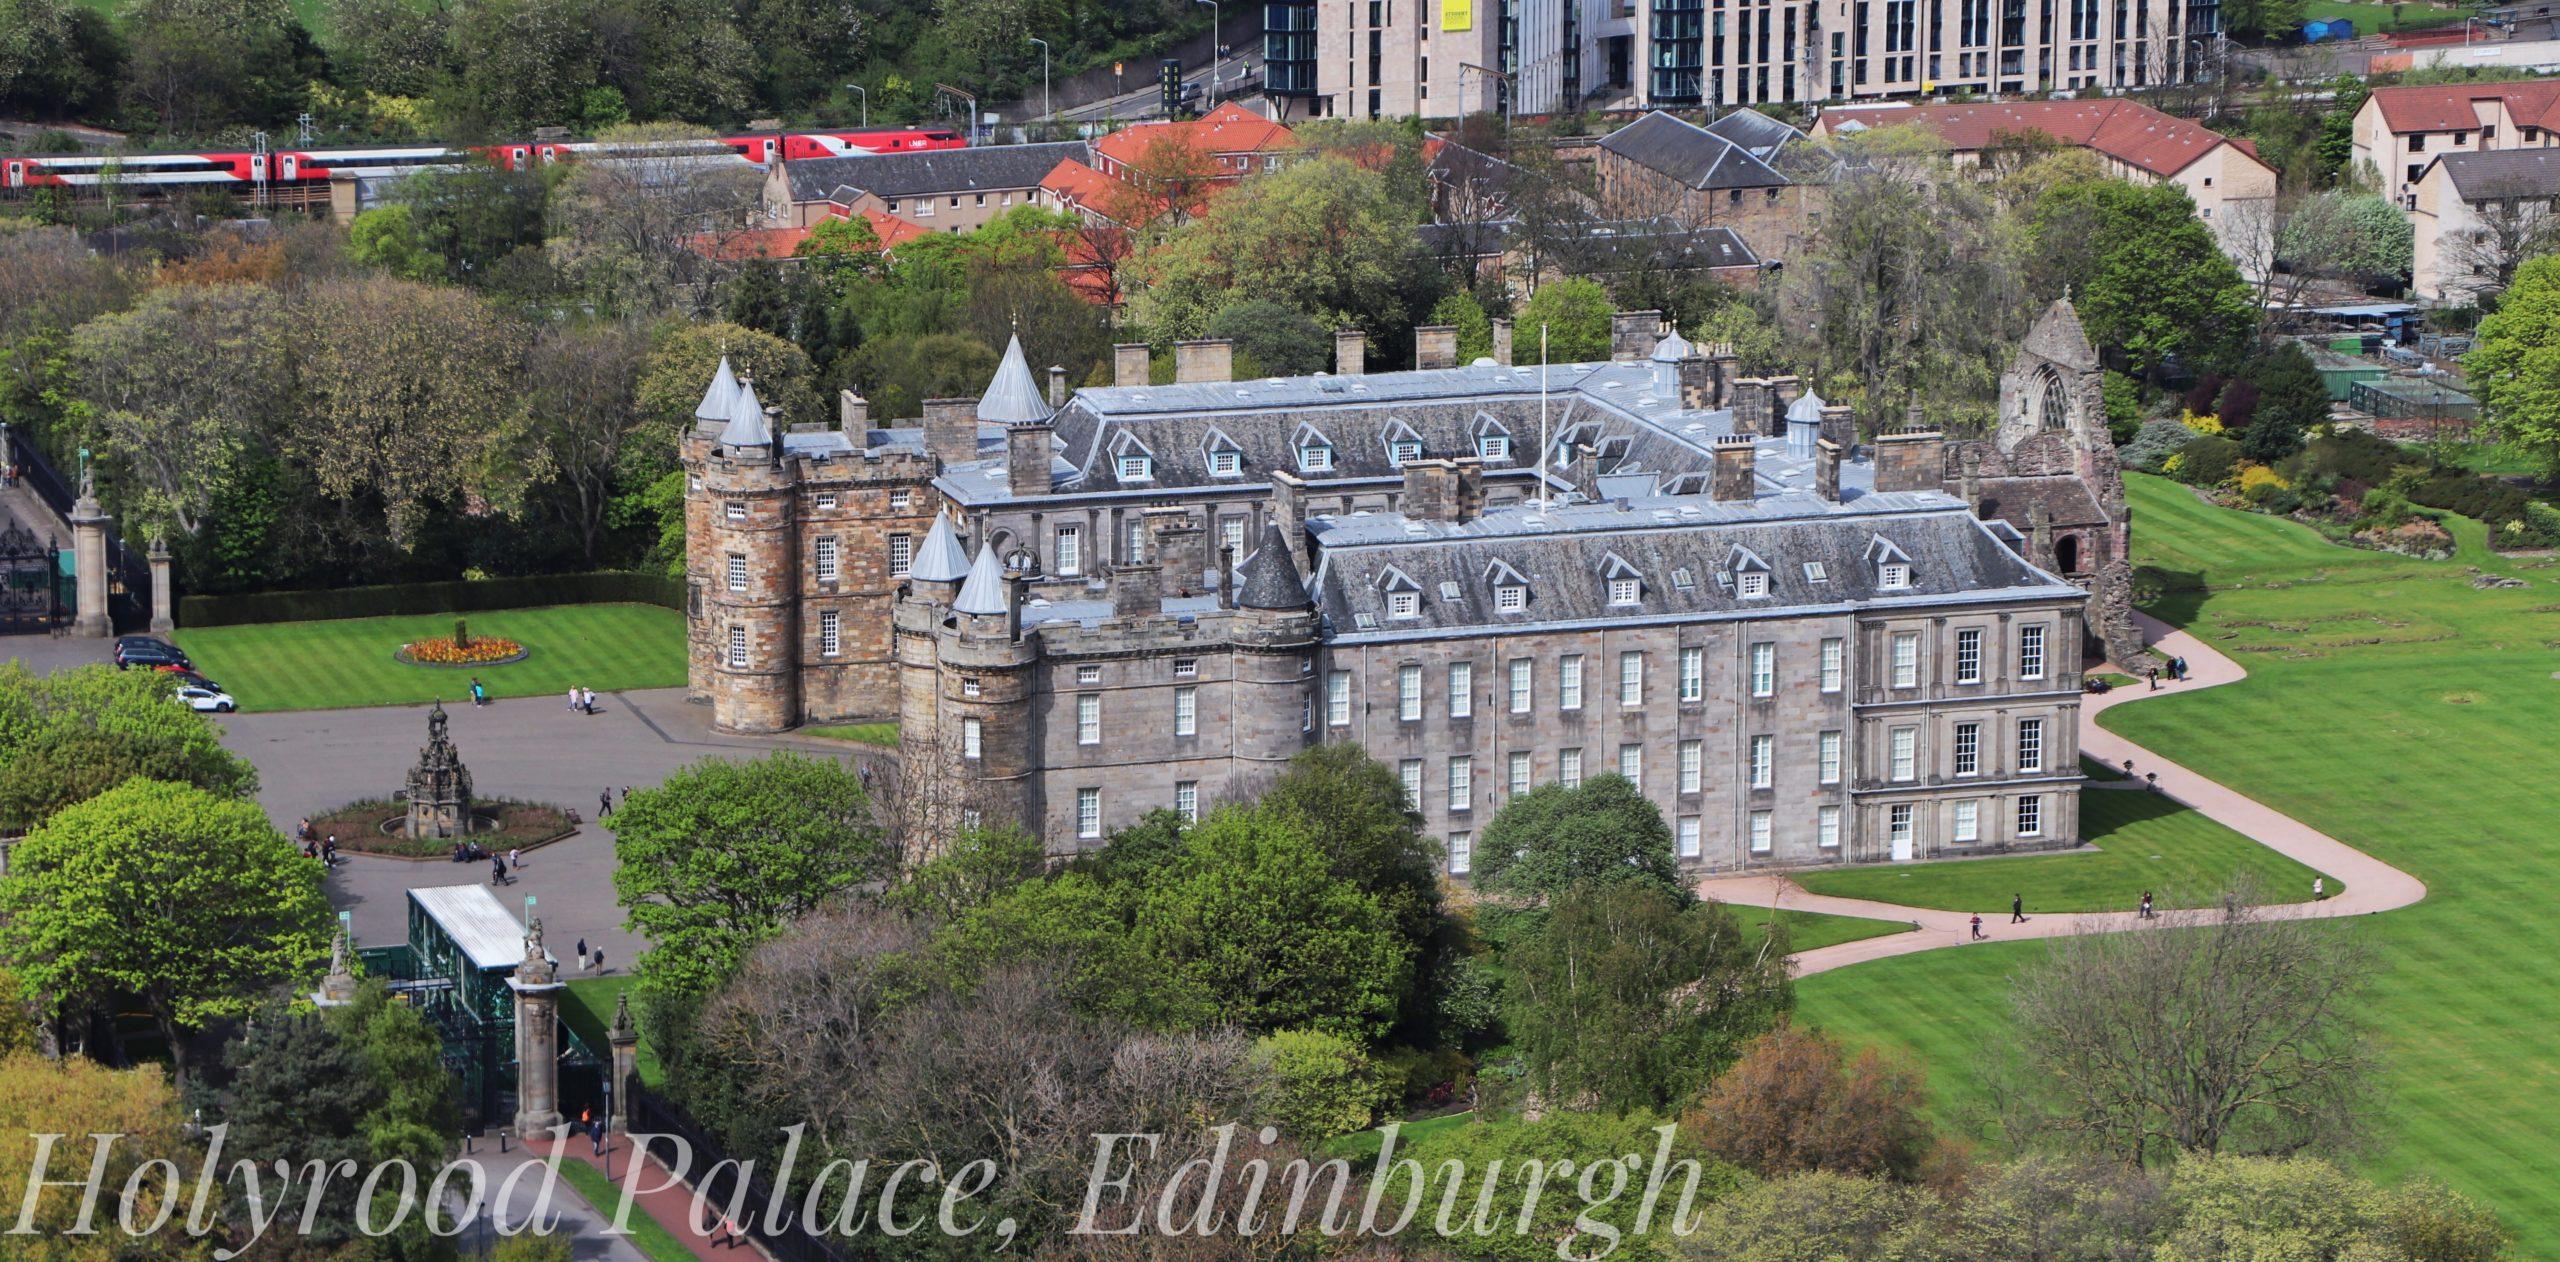 Holyrood Palace in Edinburgh Scotland